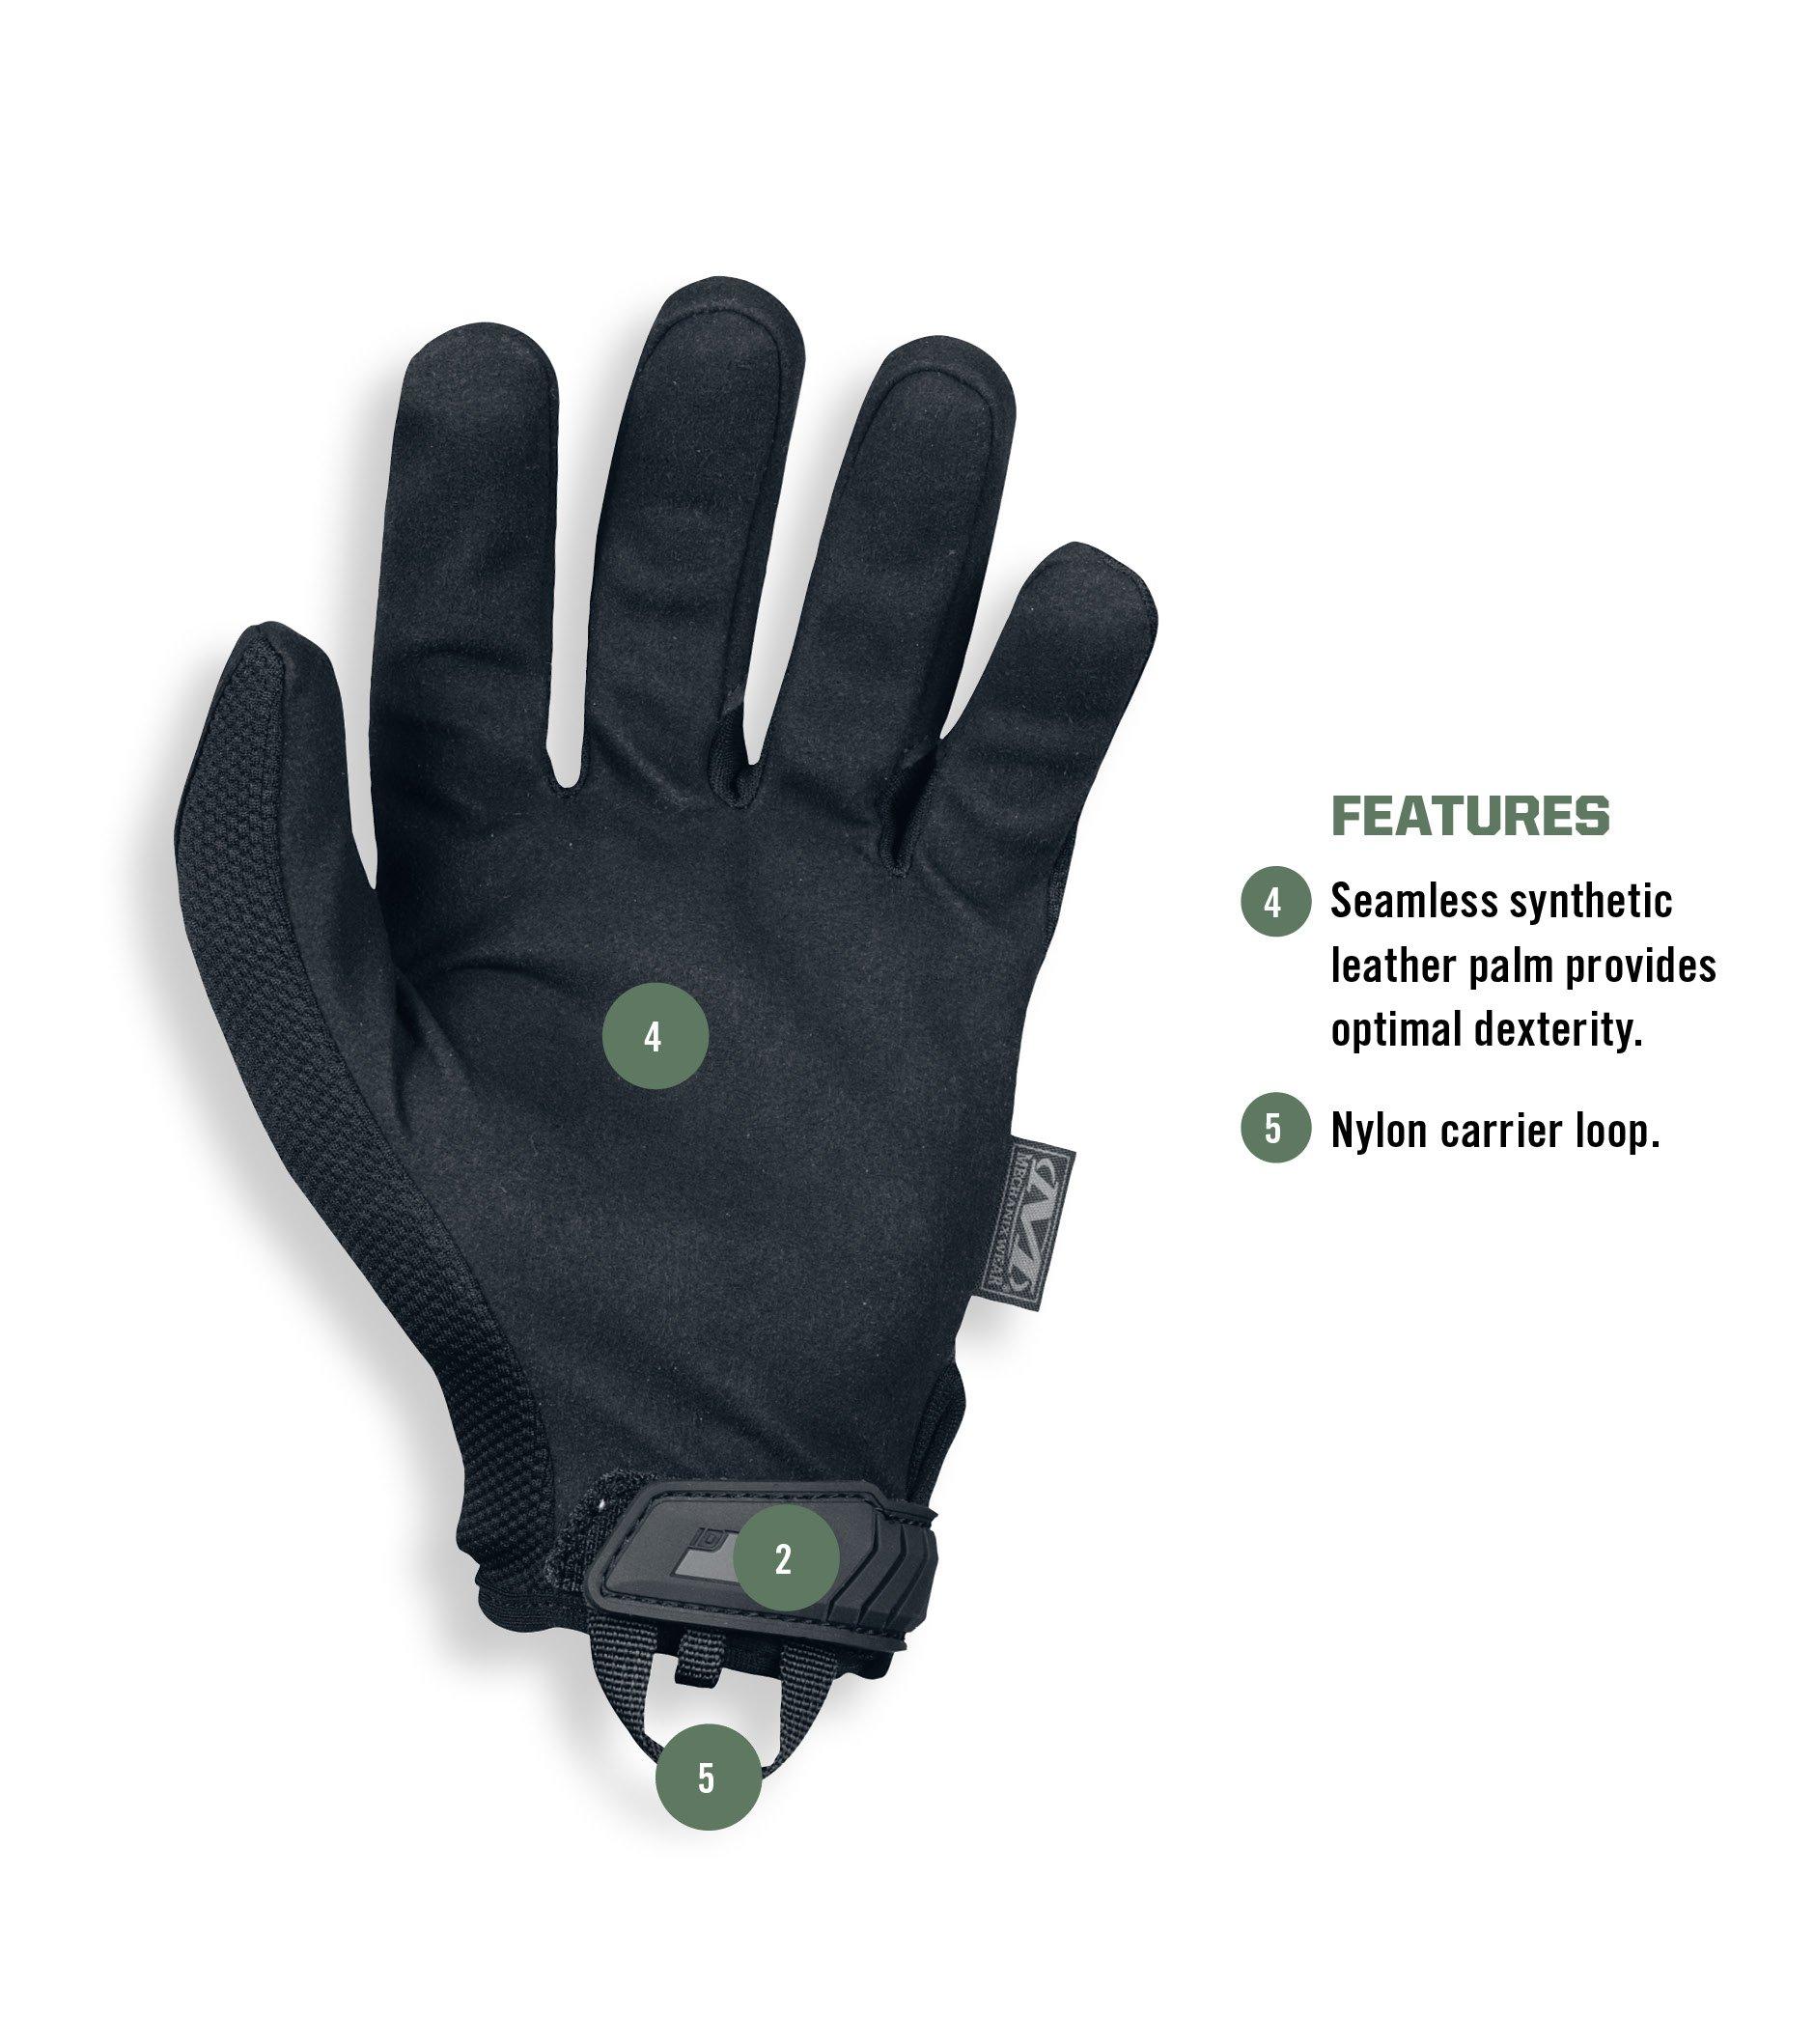 Mechanix Wear - Original Covert Tactical Gloves (Large, Black) by Mechanix Wear (Image #3)